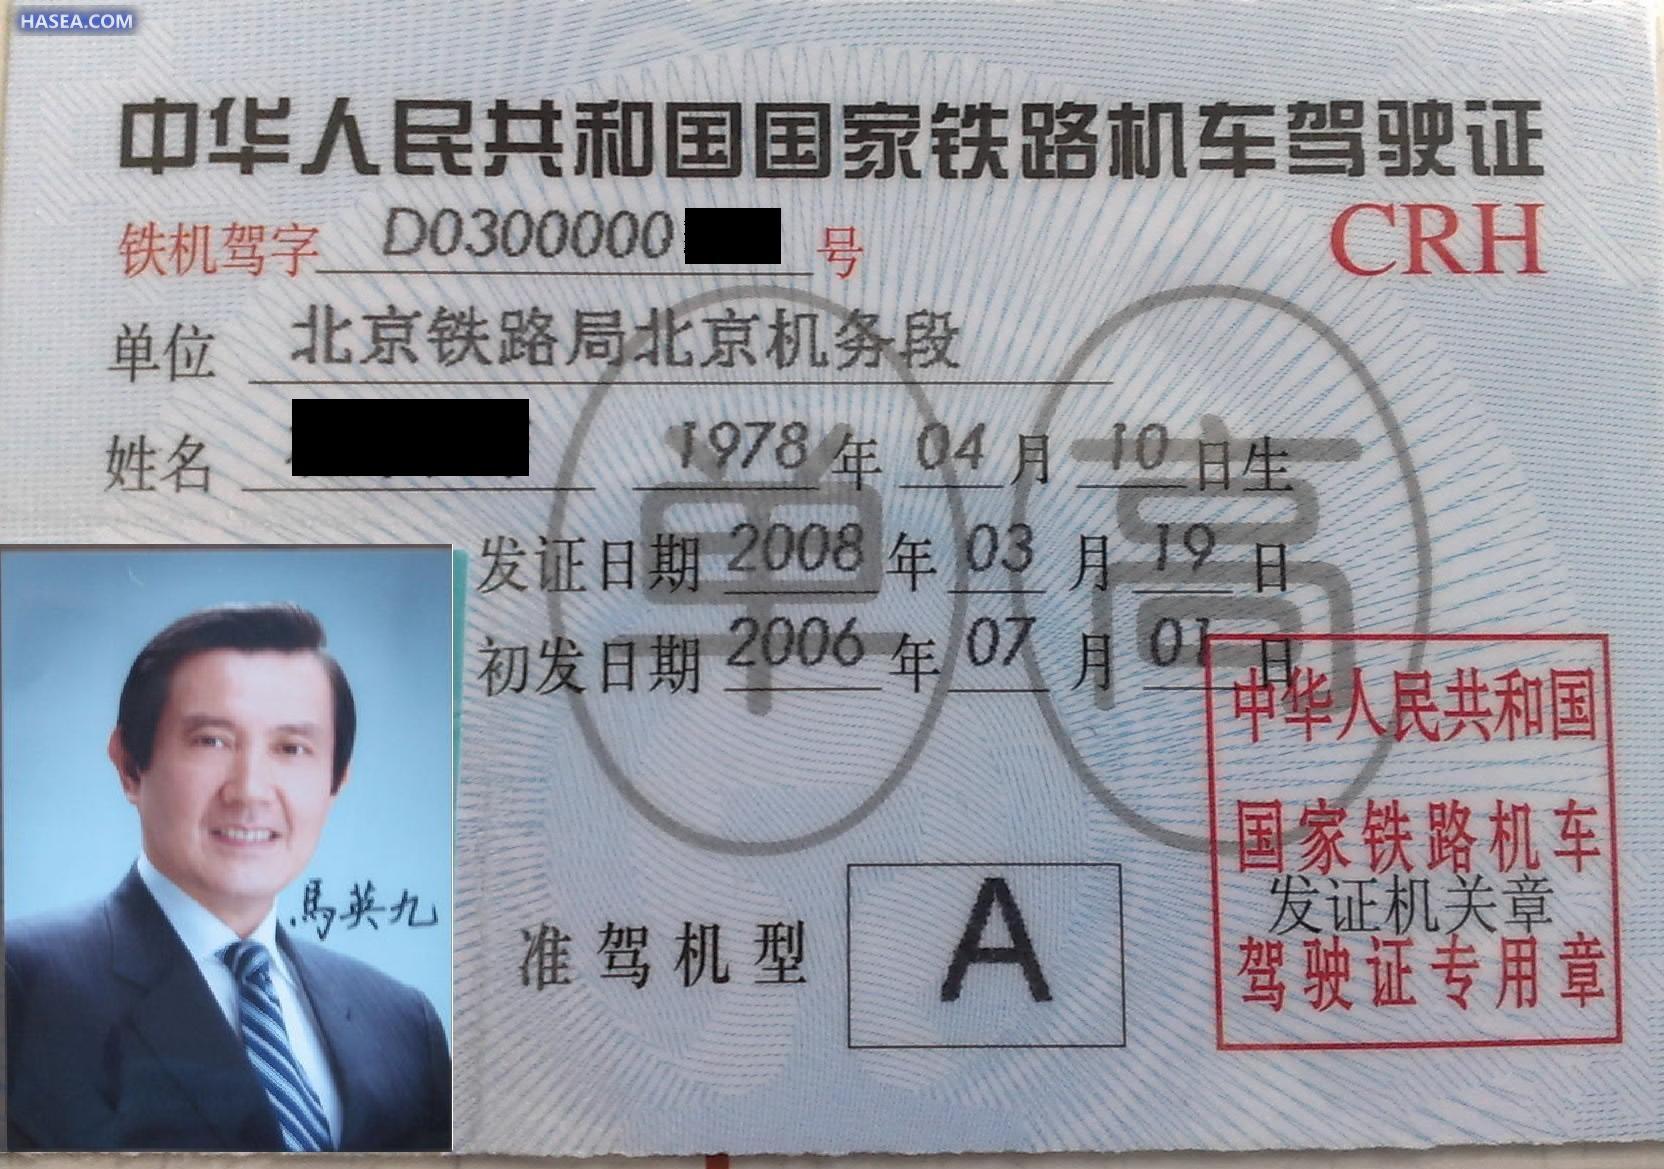 crh驾驶证 高铁驾驶证 CRH 动车组驾驶证什么样? 资料